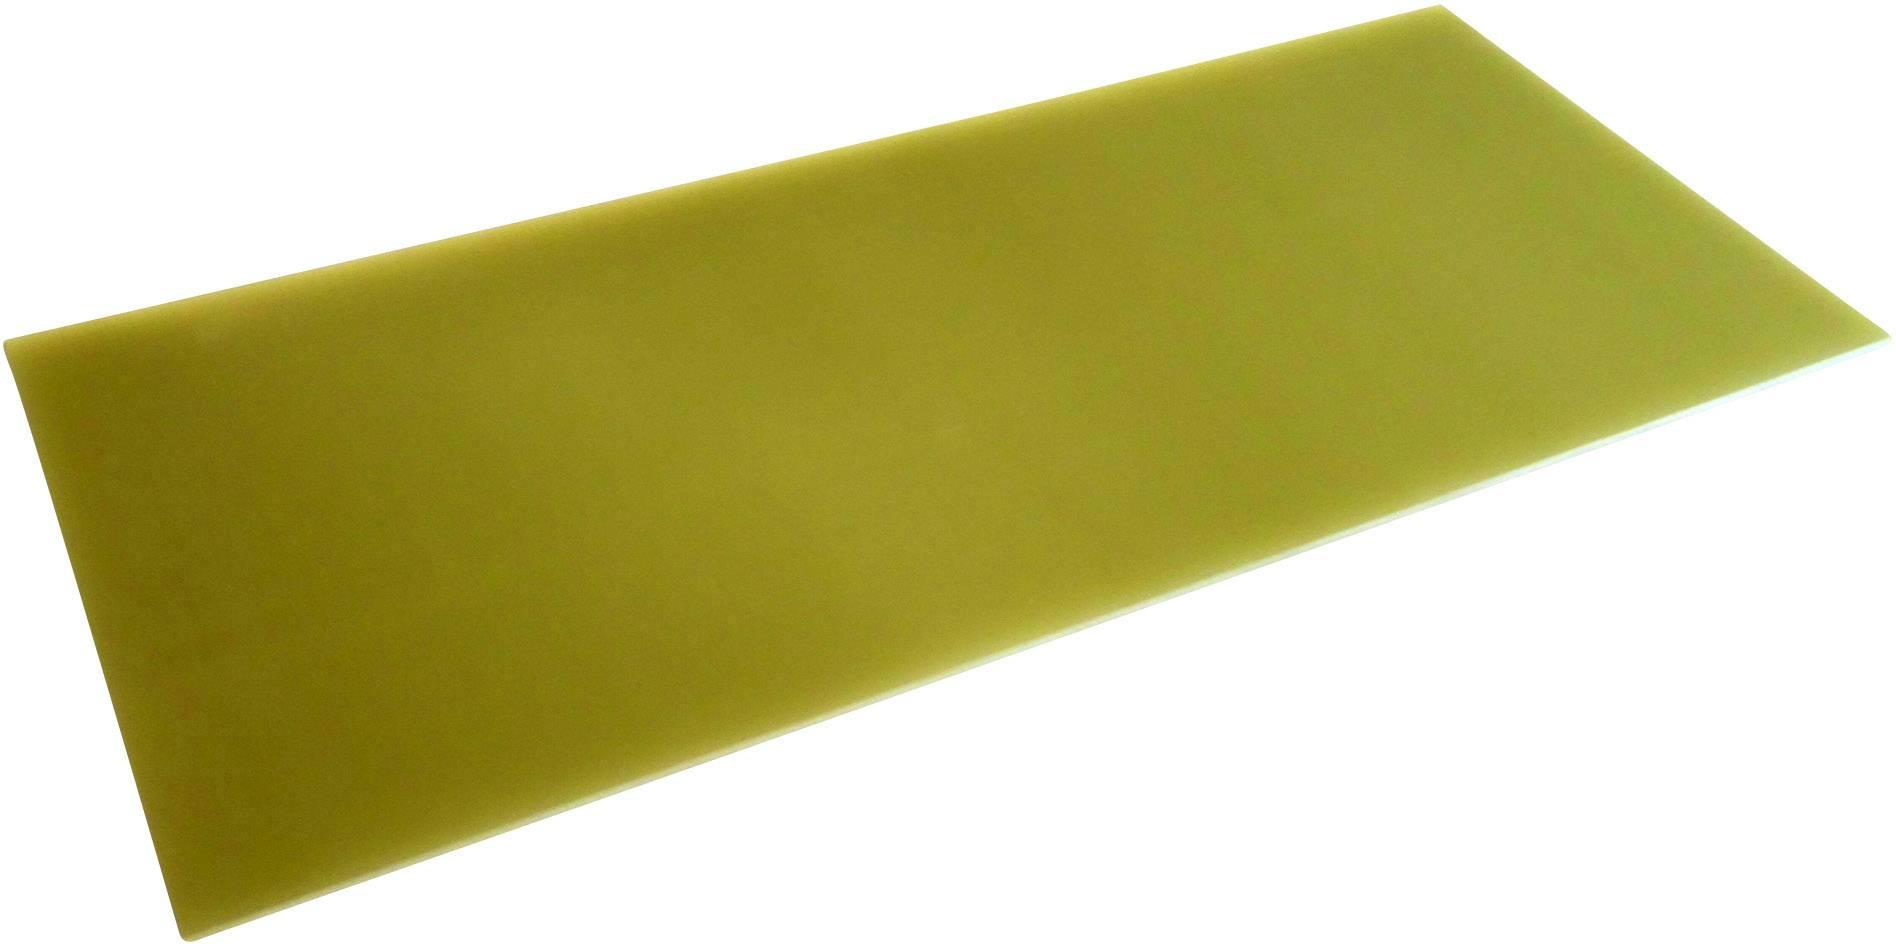 Epoxidová deska Carbotex 150 x350 x 0,3 mm